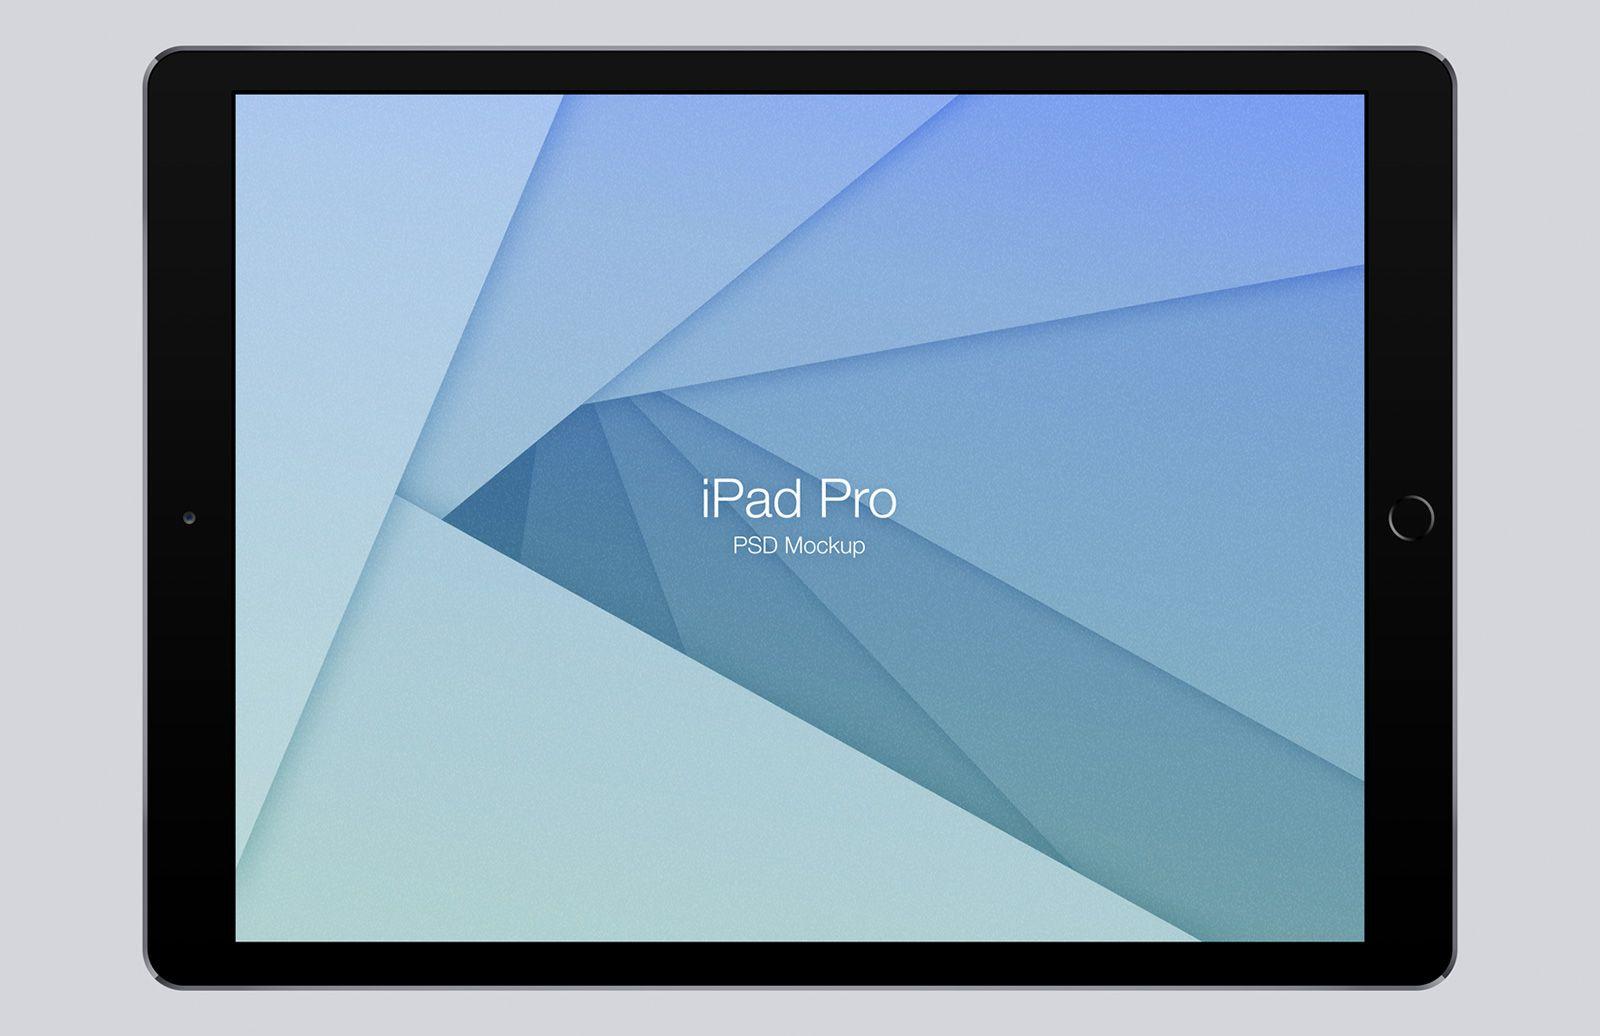 Ipad Pro Mockup Psd App Interface Ipad Pro Mobile Application Design